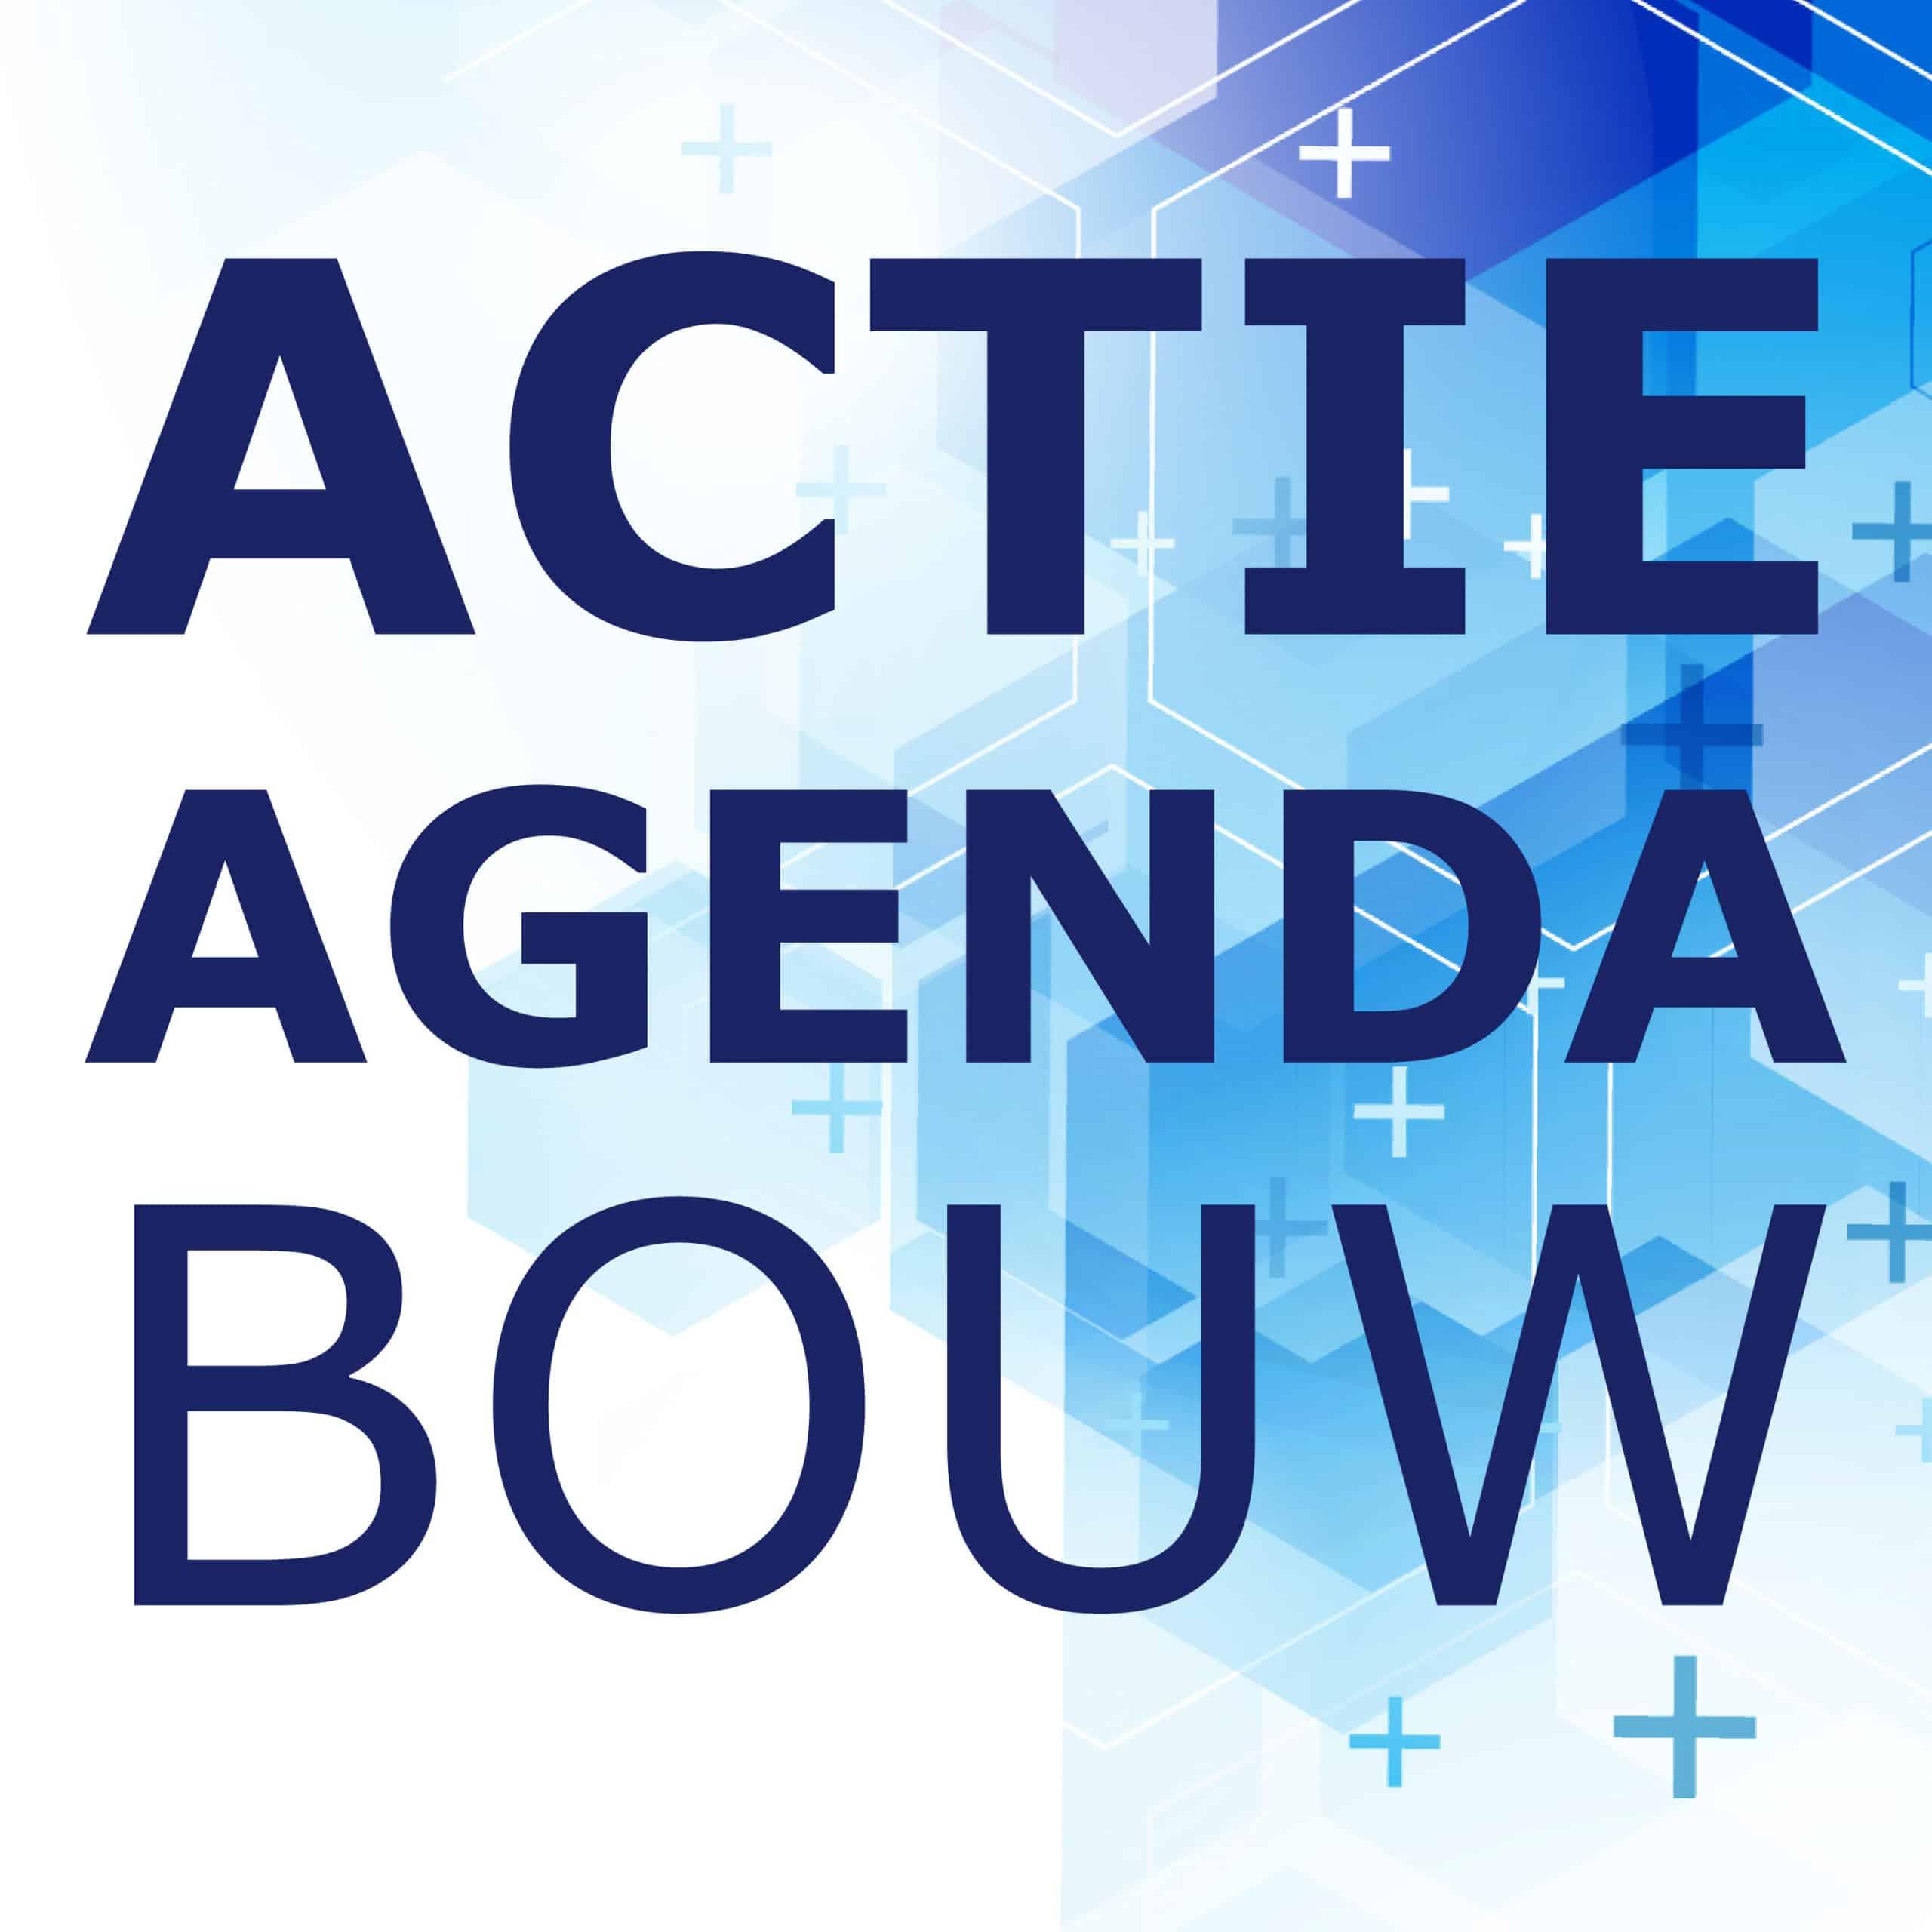 Actieagenda-Bouw-logo-2-scaled